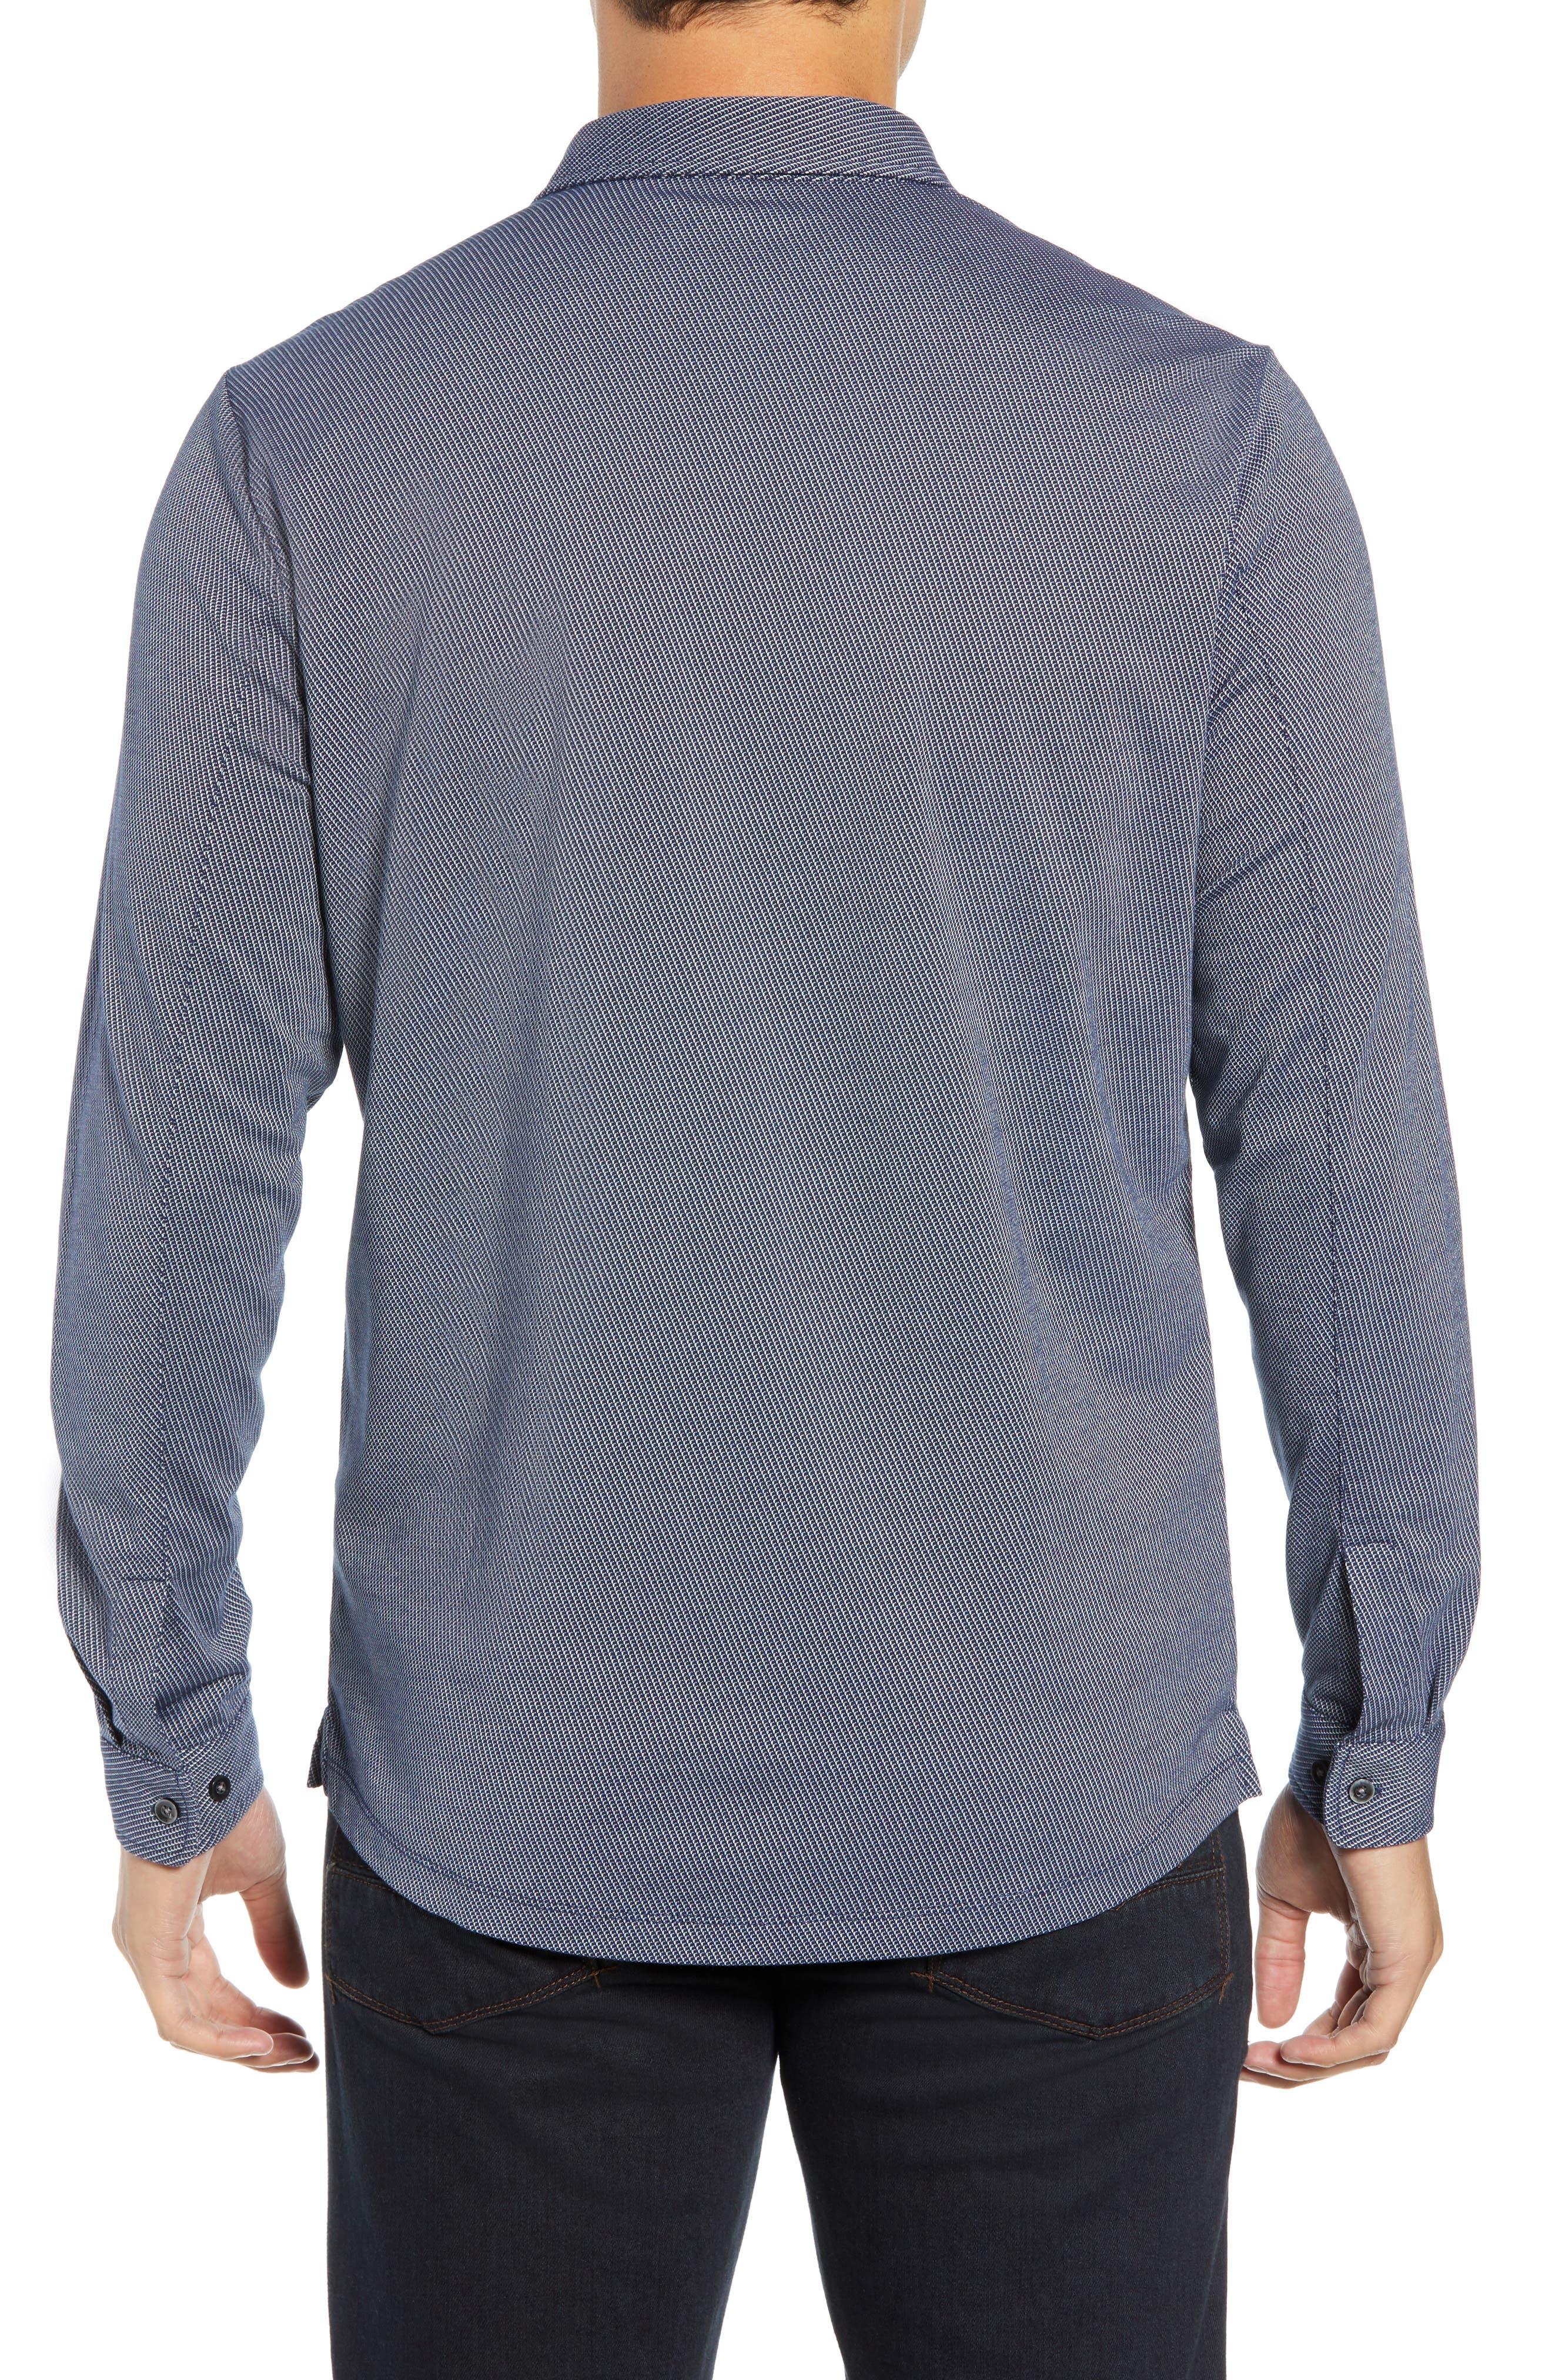 Colby Regular Fit Knit Sport Shirt,                             Alternate thumbnail 3, color,                             NAVY